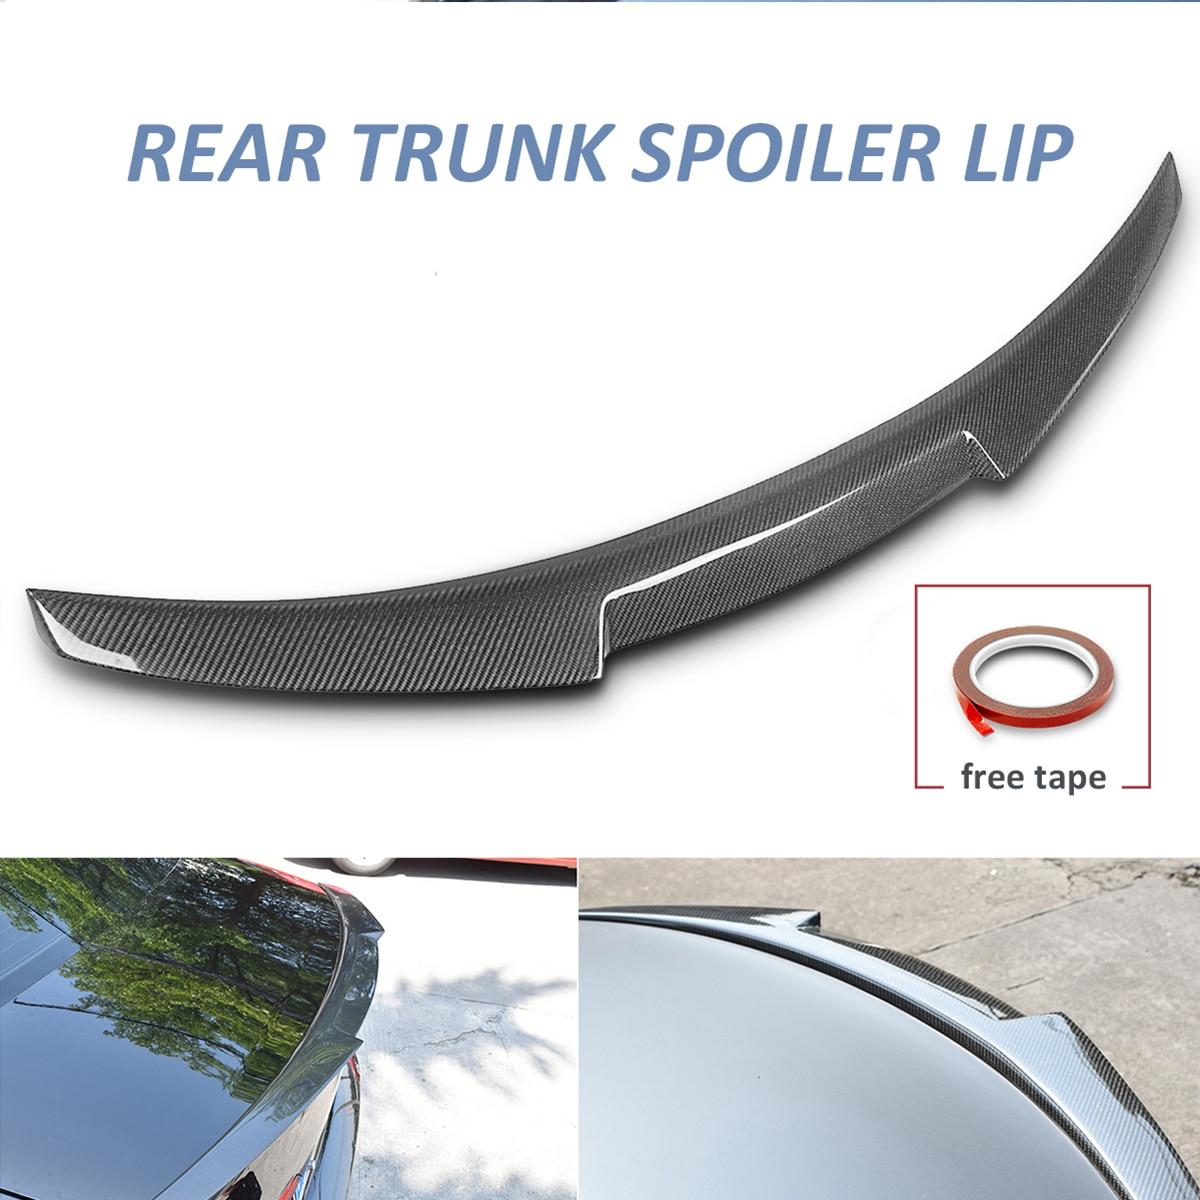 Real Carbon Fiber Rear Trunk Spoiler Lip M4 Style For Audi A6 C7 Sedan Quattro 2013-2016 Rear Wing Spoiler Rear Trunk Roof Wing a4 b7 rear roof lip spoiler wing for audi a4 b7 2005 2008 carbon fiber abt style